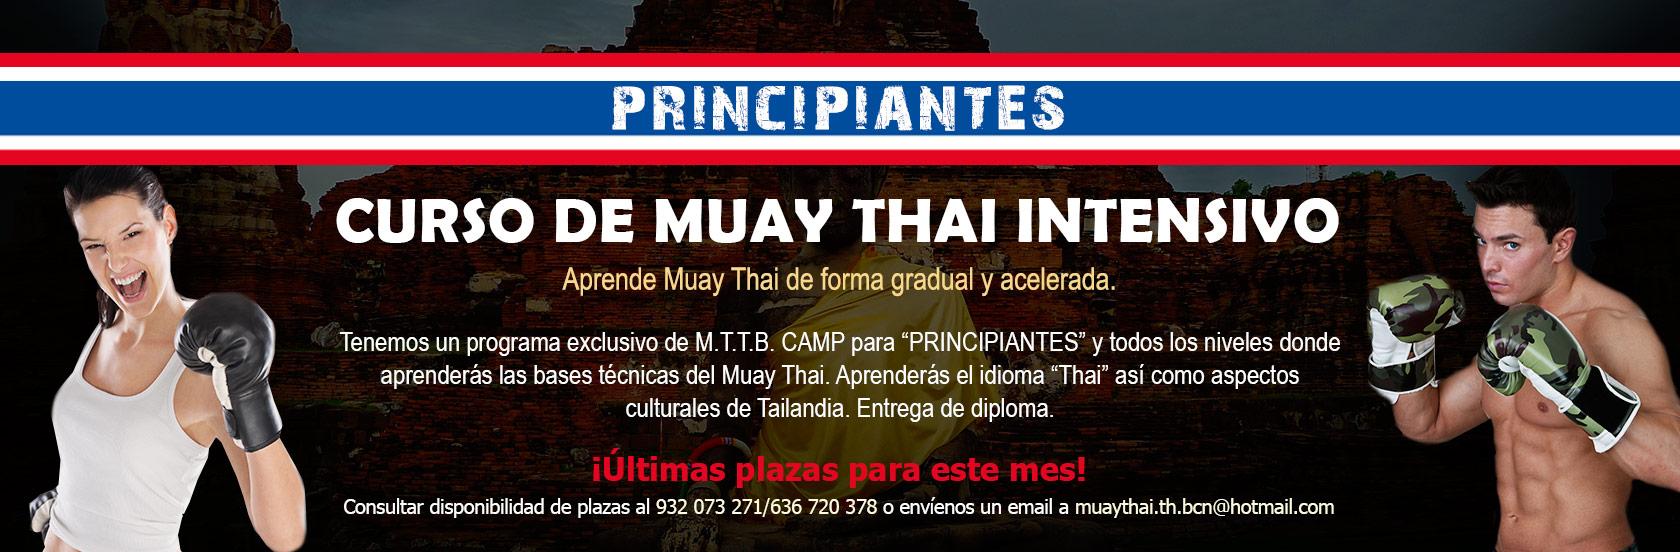 Curso de Muay Thai intensivo